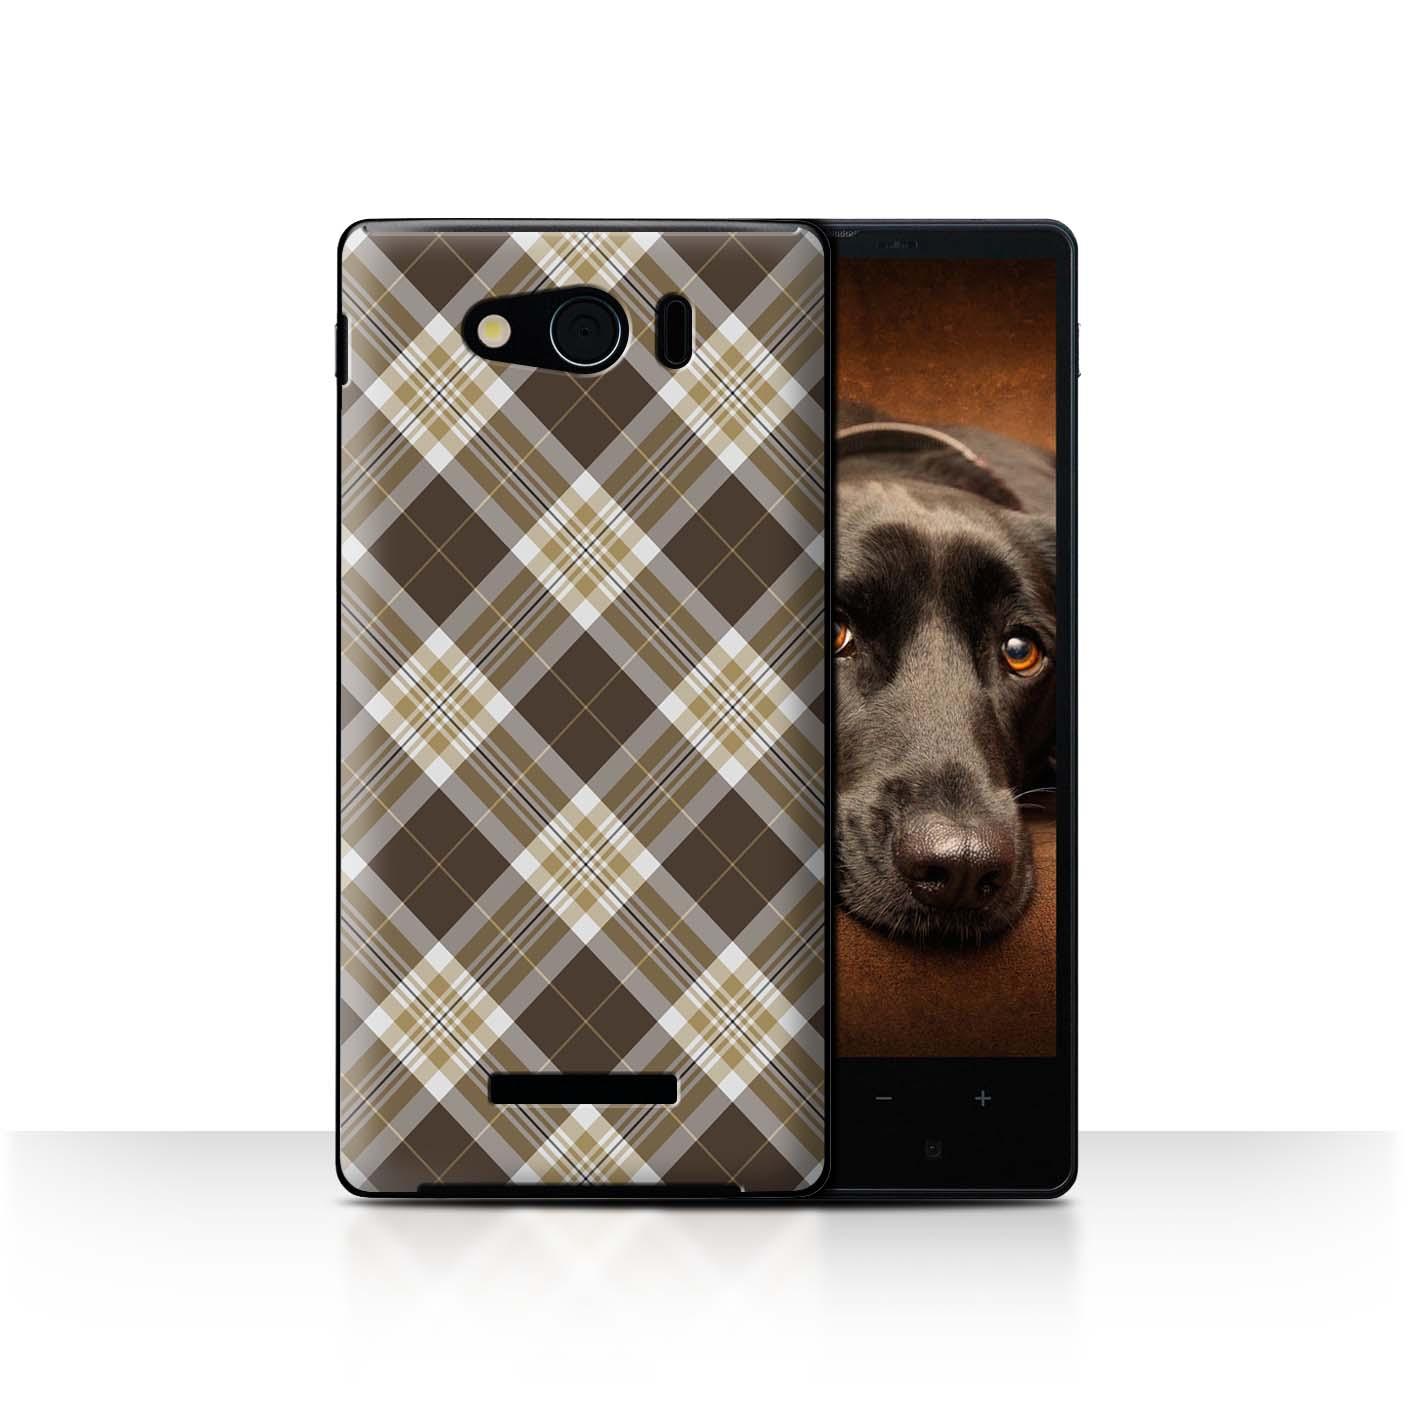 STUFF4-Back-Case-Cover-Skin-for-Sharp-Aquos-Xx-Mini-303SH-Tartan-Picnic-Pattern